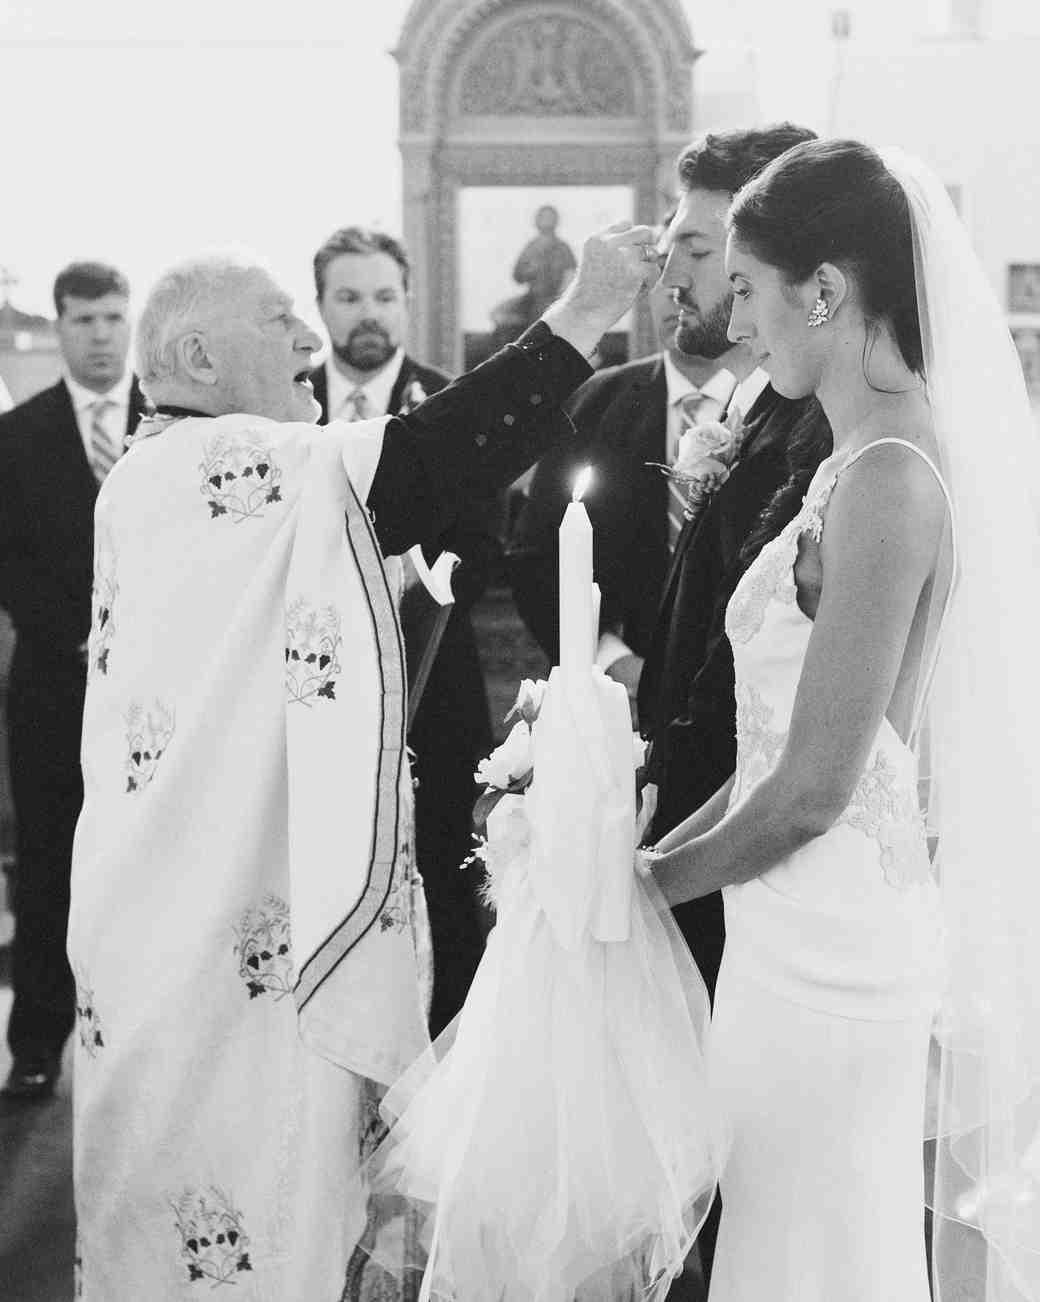 rosie-constantine-wedding-ceremony-134-s112177-1015.jpg